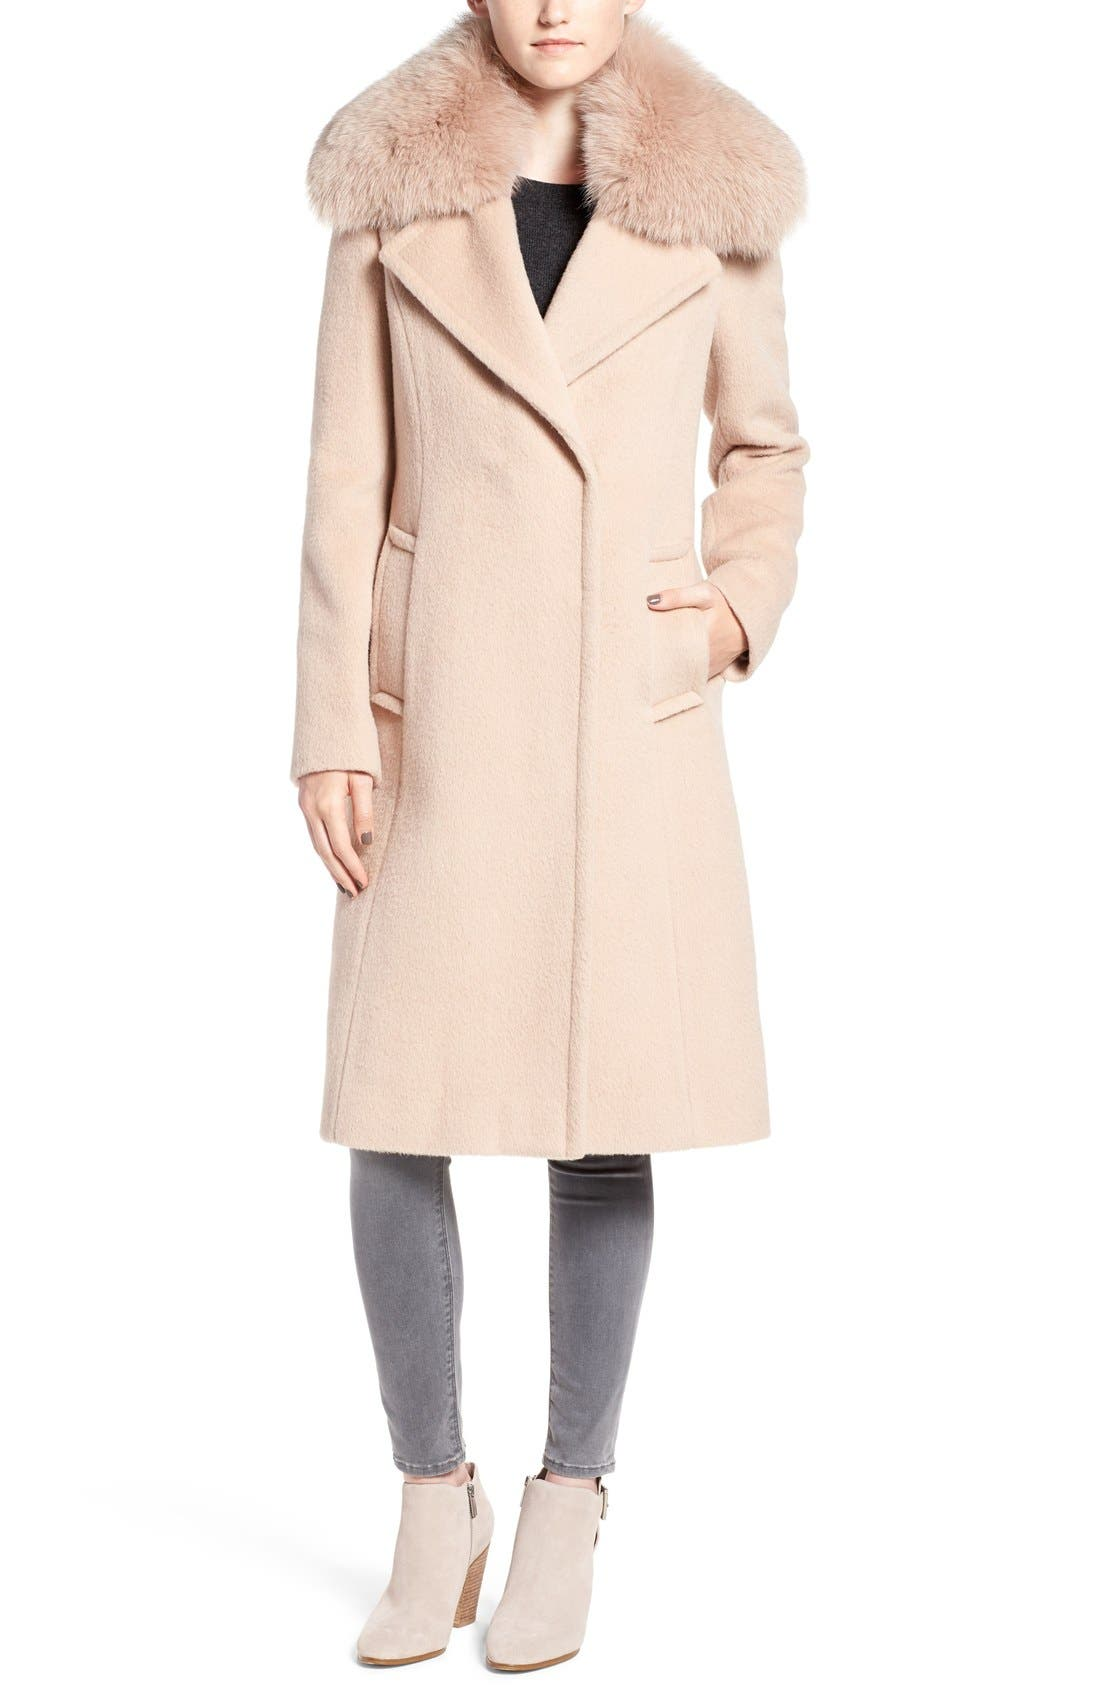 Alternate Image 1 Selected - Diane von Furstenberg Genuine Fox Fur Trim Notch Collar Long Wool Blend Coat